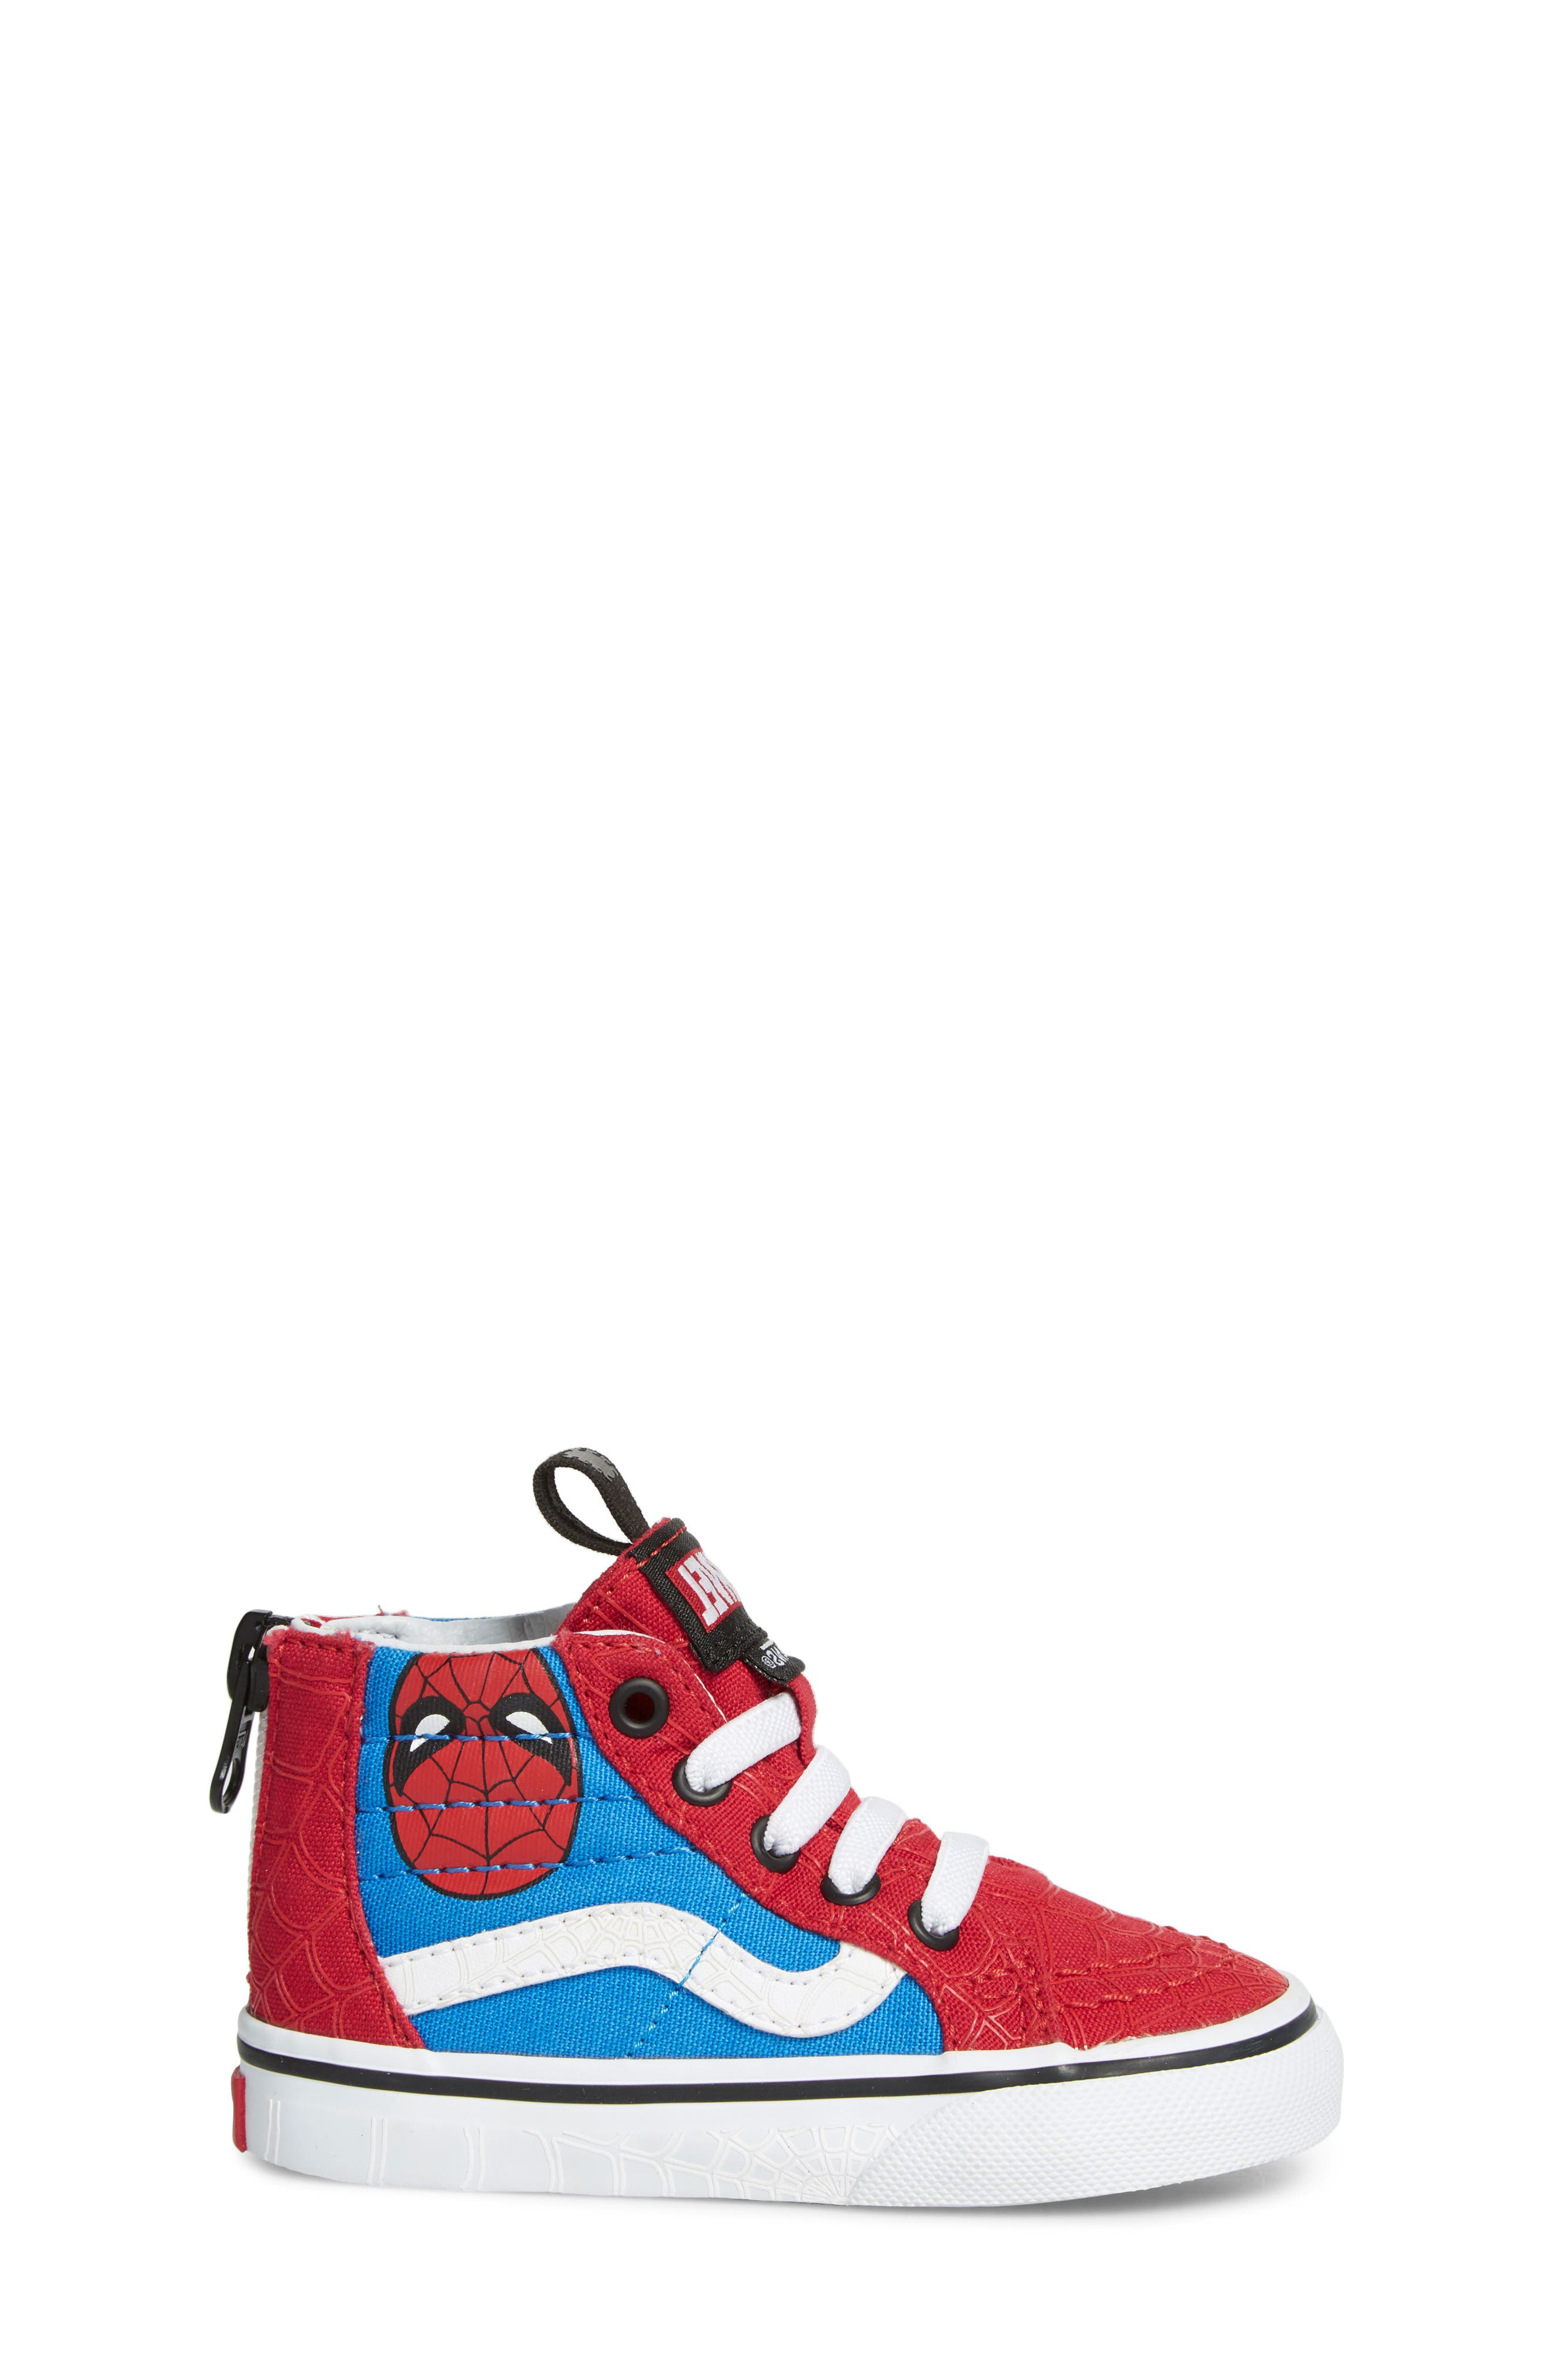 x Marvel<sup>®</sup> Spider-Man SK8-Hi Sneaker,                             Alternate thumbnail 3, color,